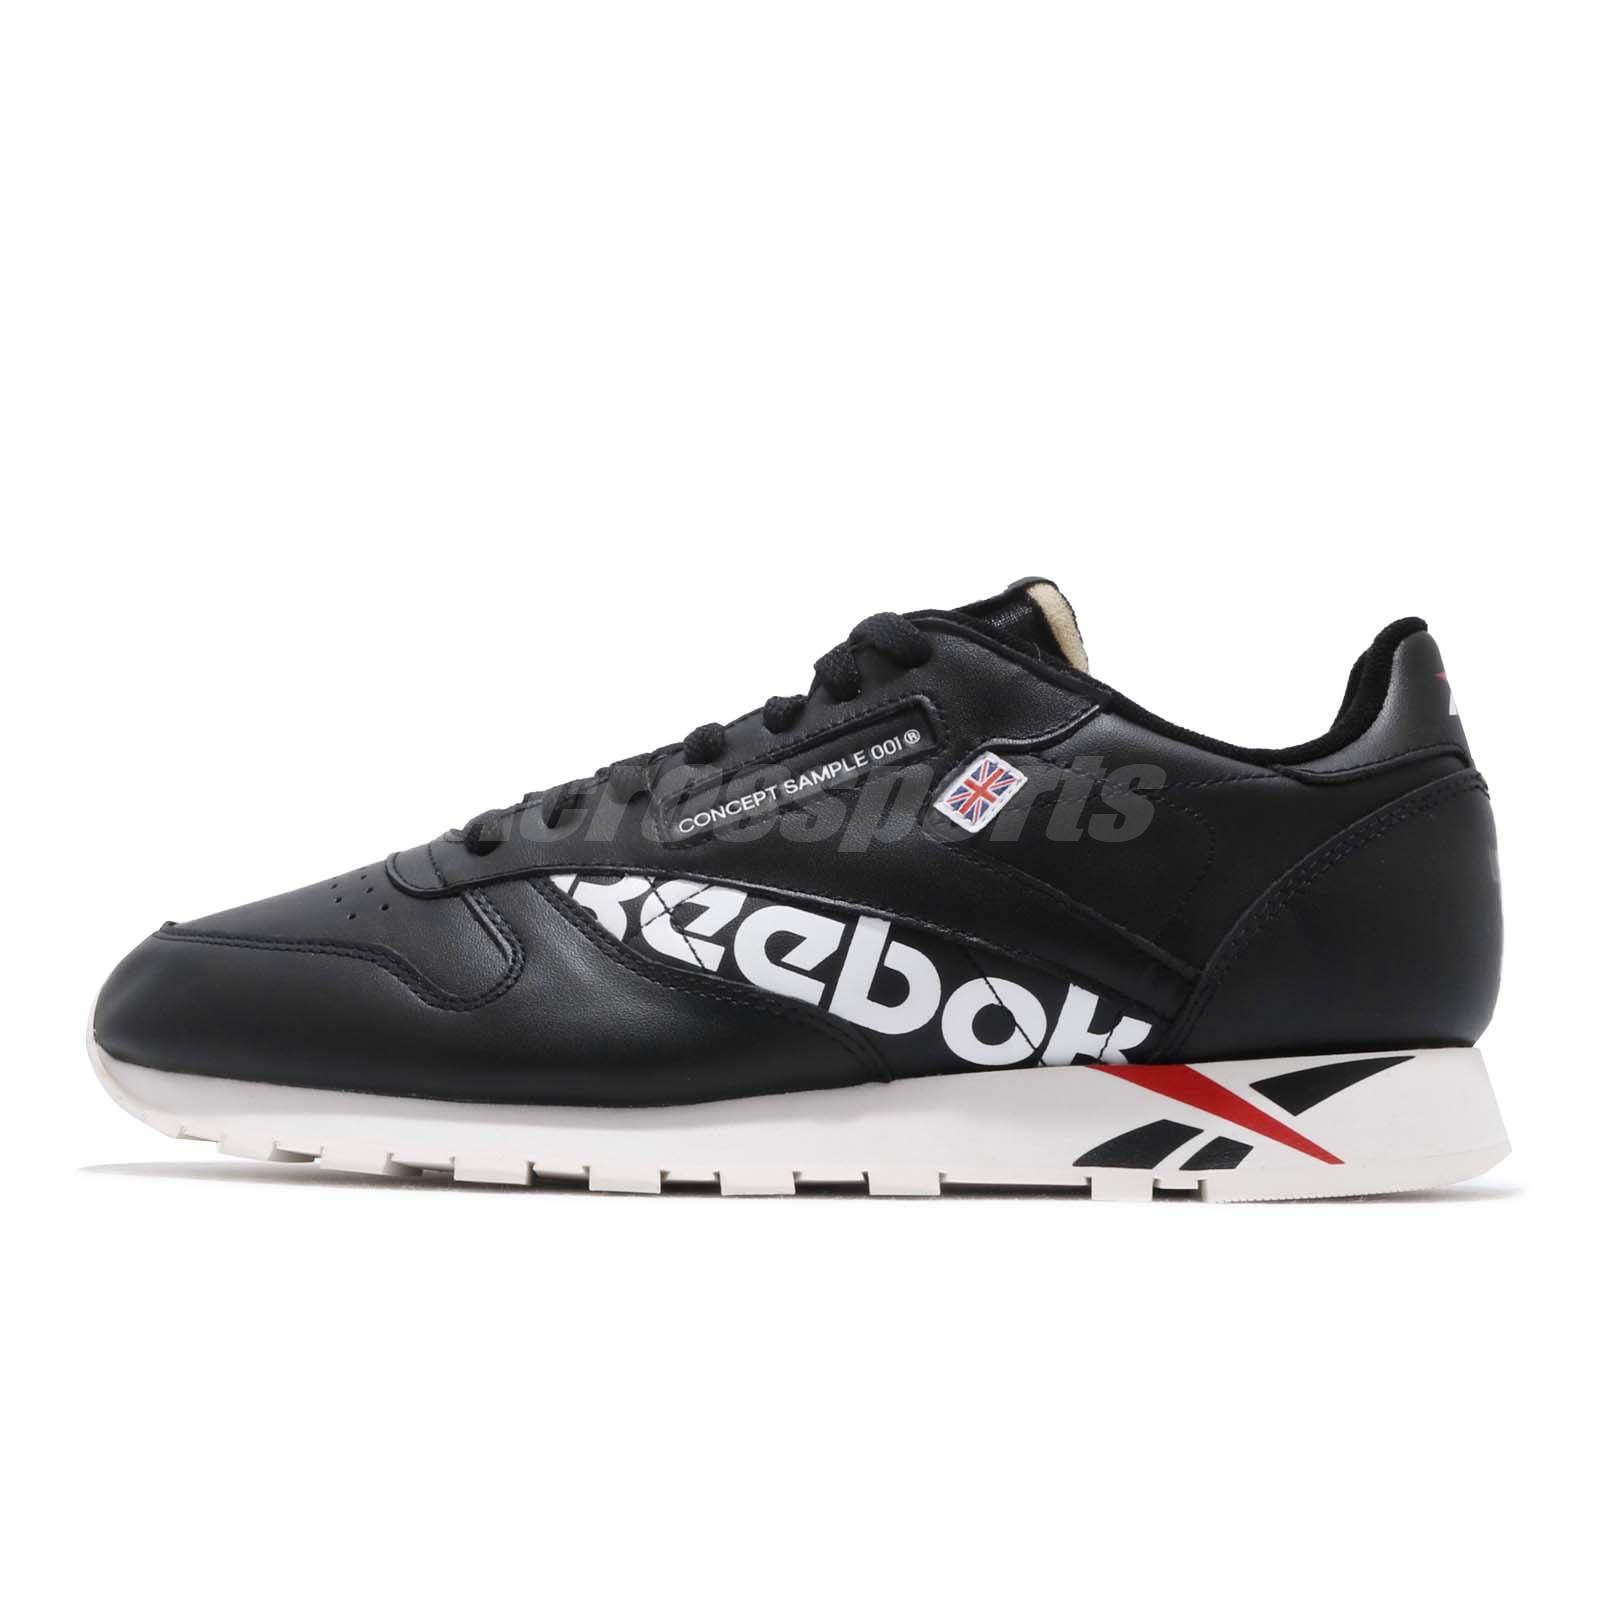 3872e316add37 Reebok Classic Leather Altered MU Black White Red Men Shoes Sneakers DV5016